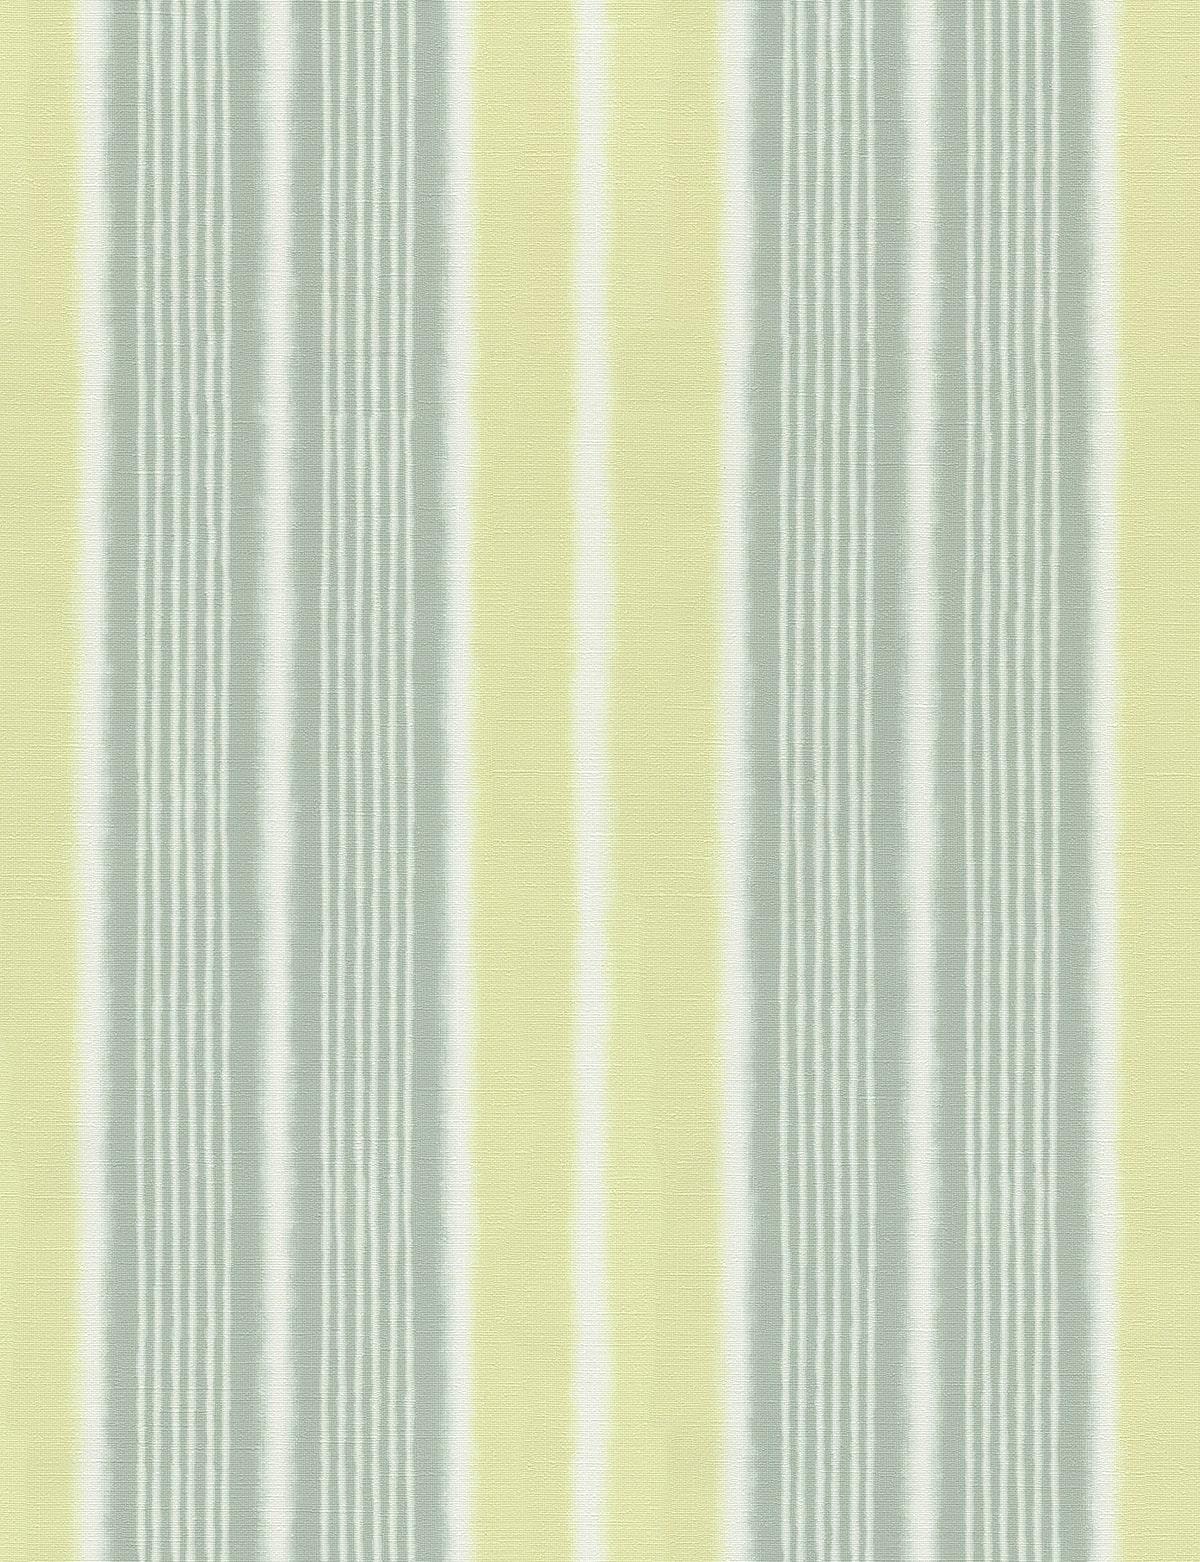 Digital Country - Collezione 2 - Unconventional Wallpaper